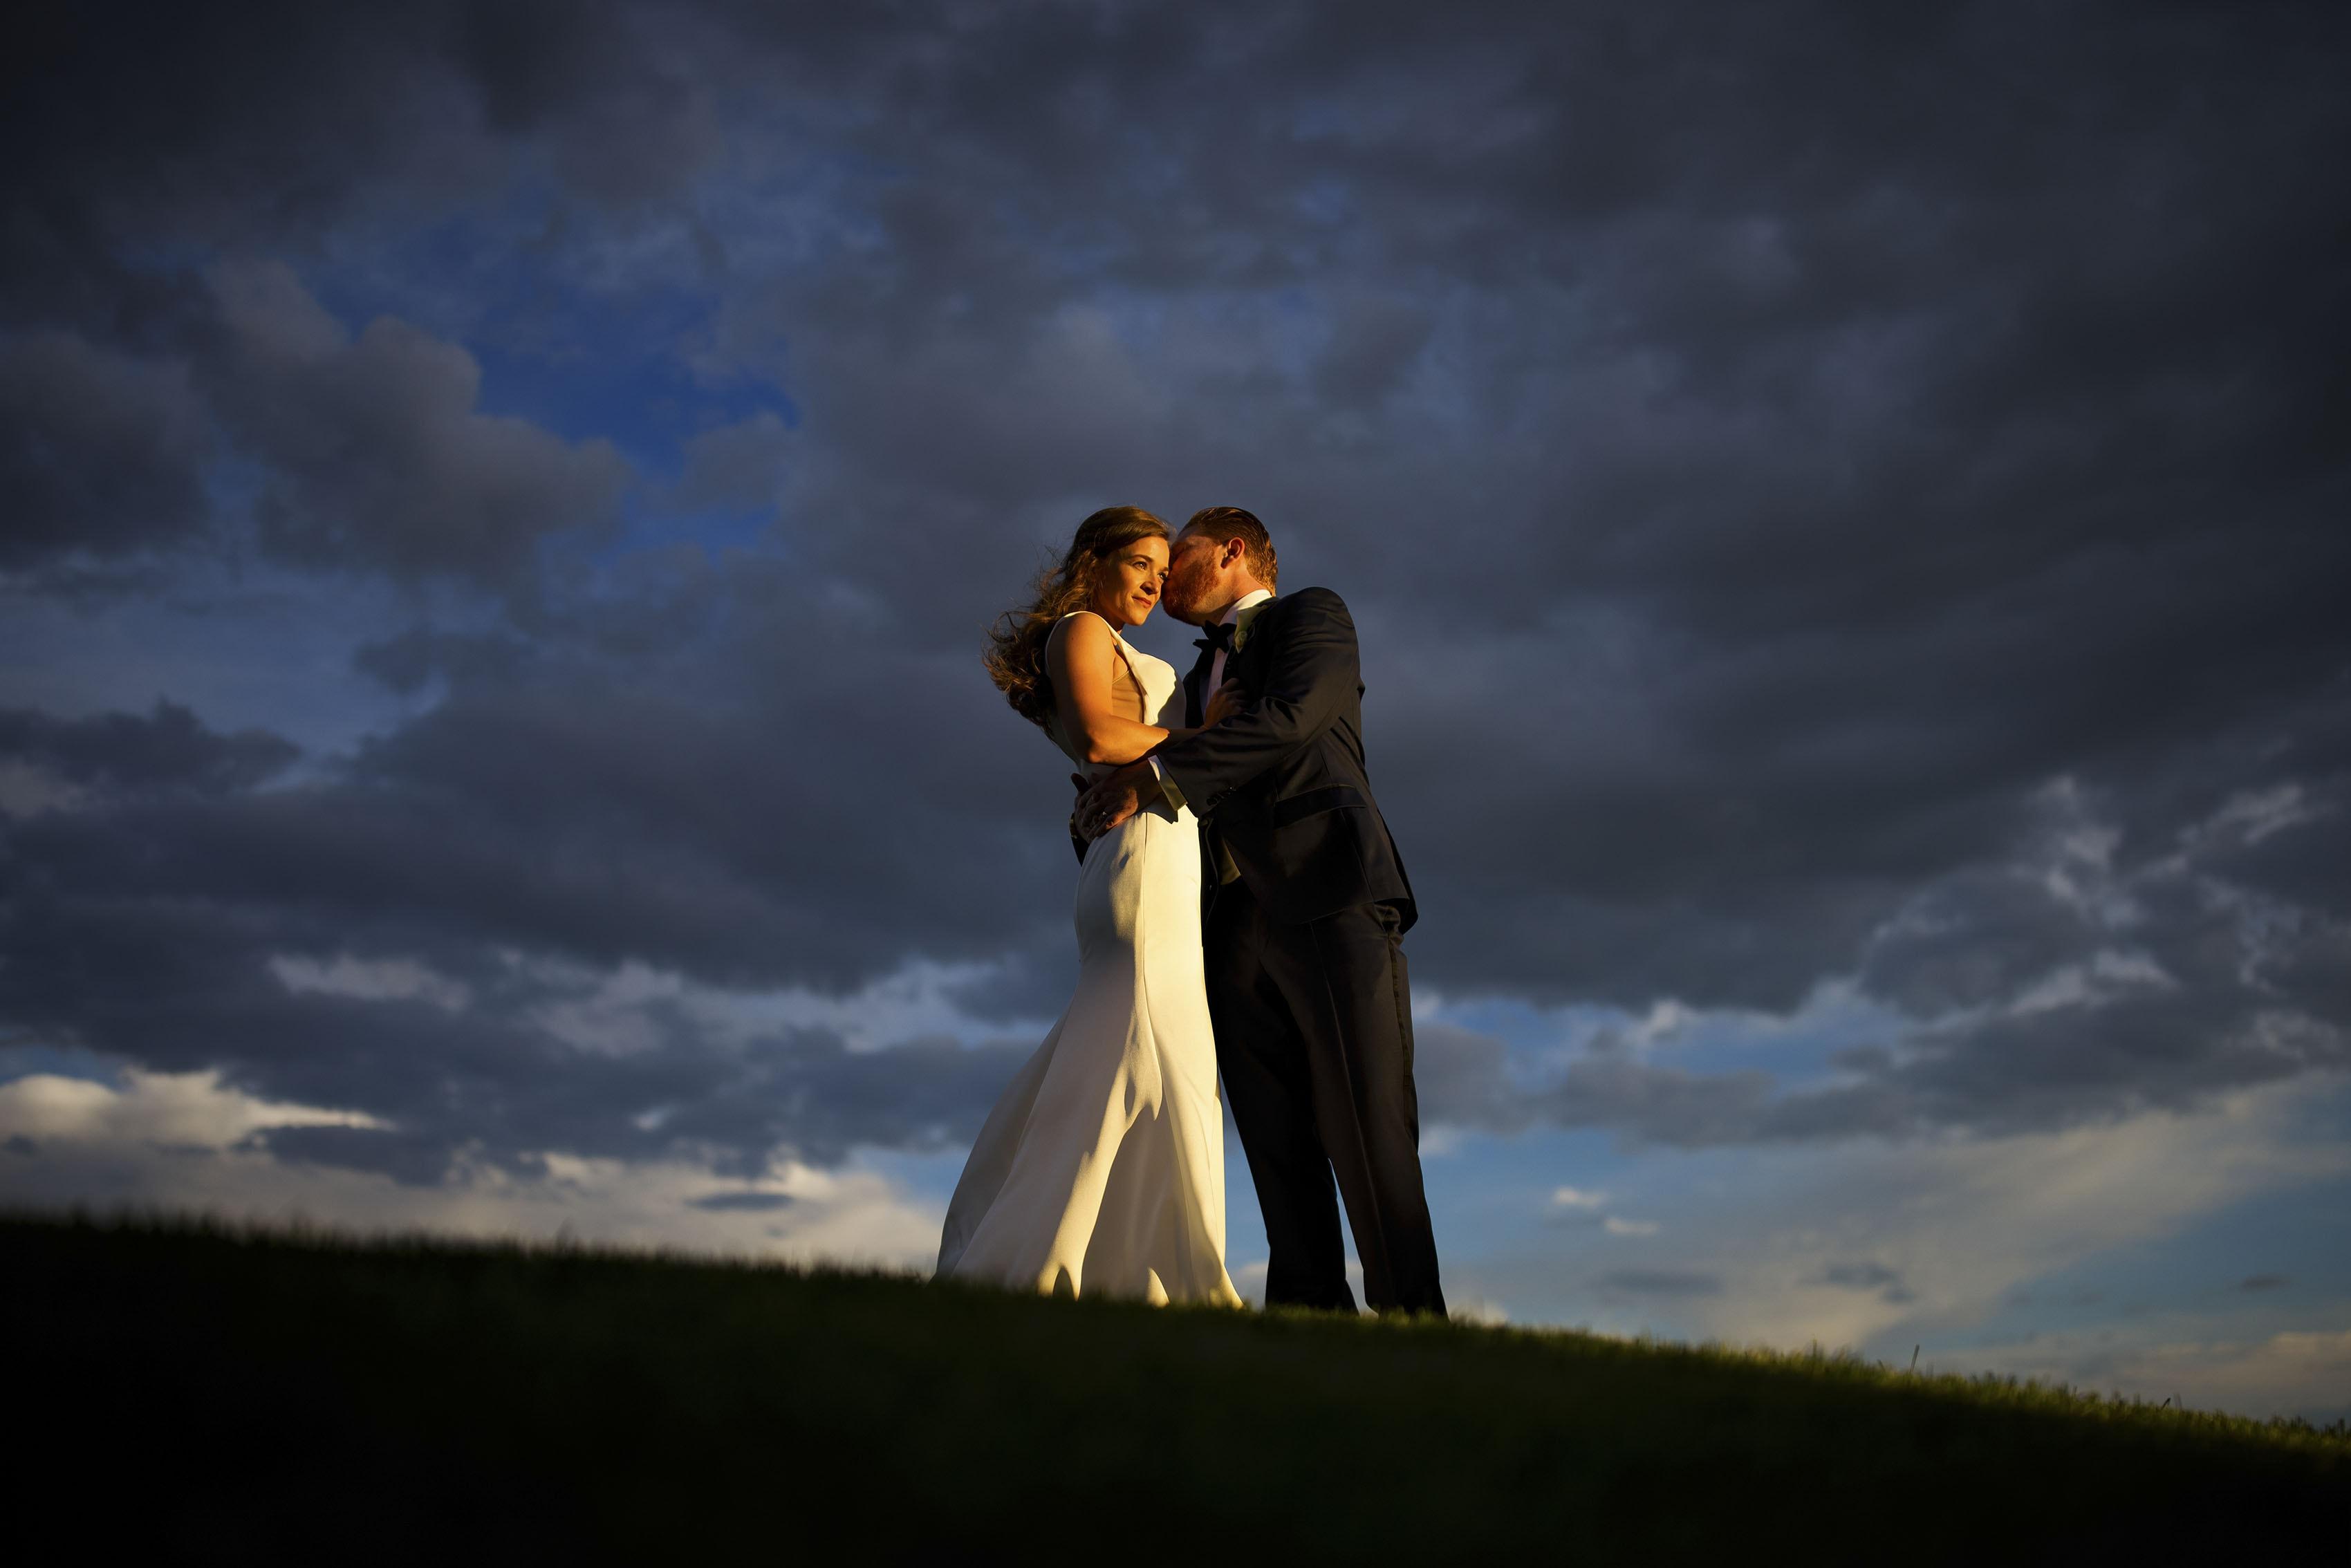 Darren kisses his bride during golden hour wedding portraits at Sanctuary Golf Course